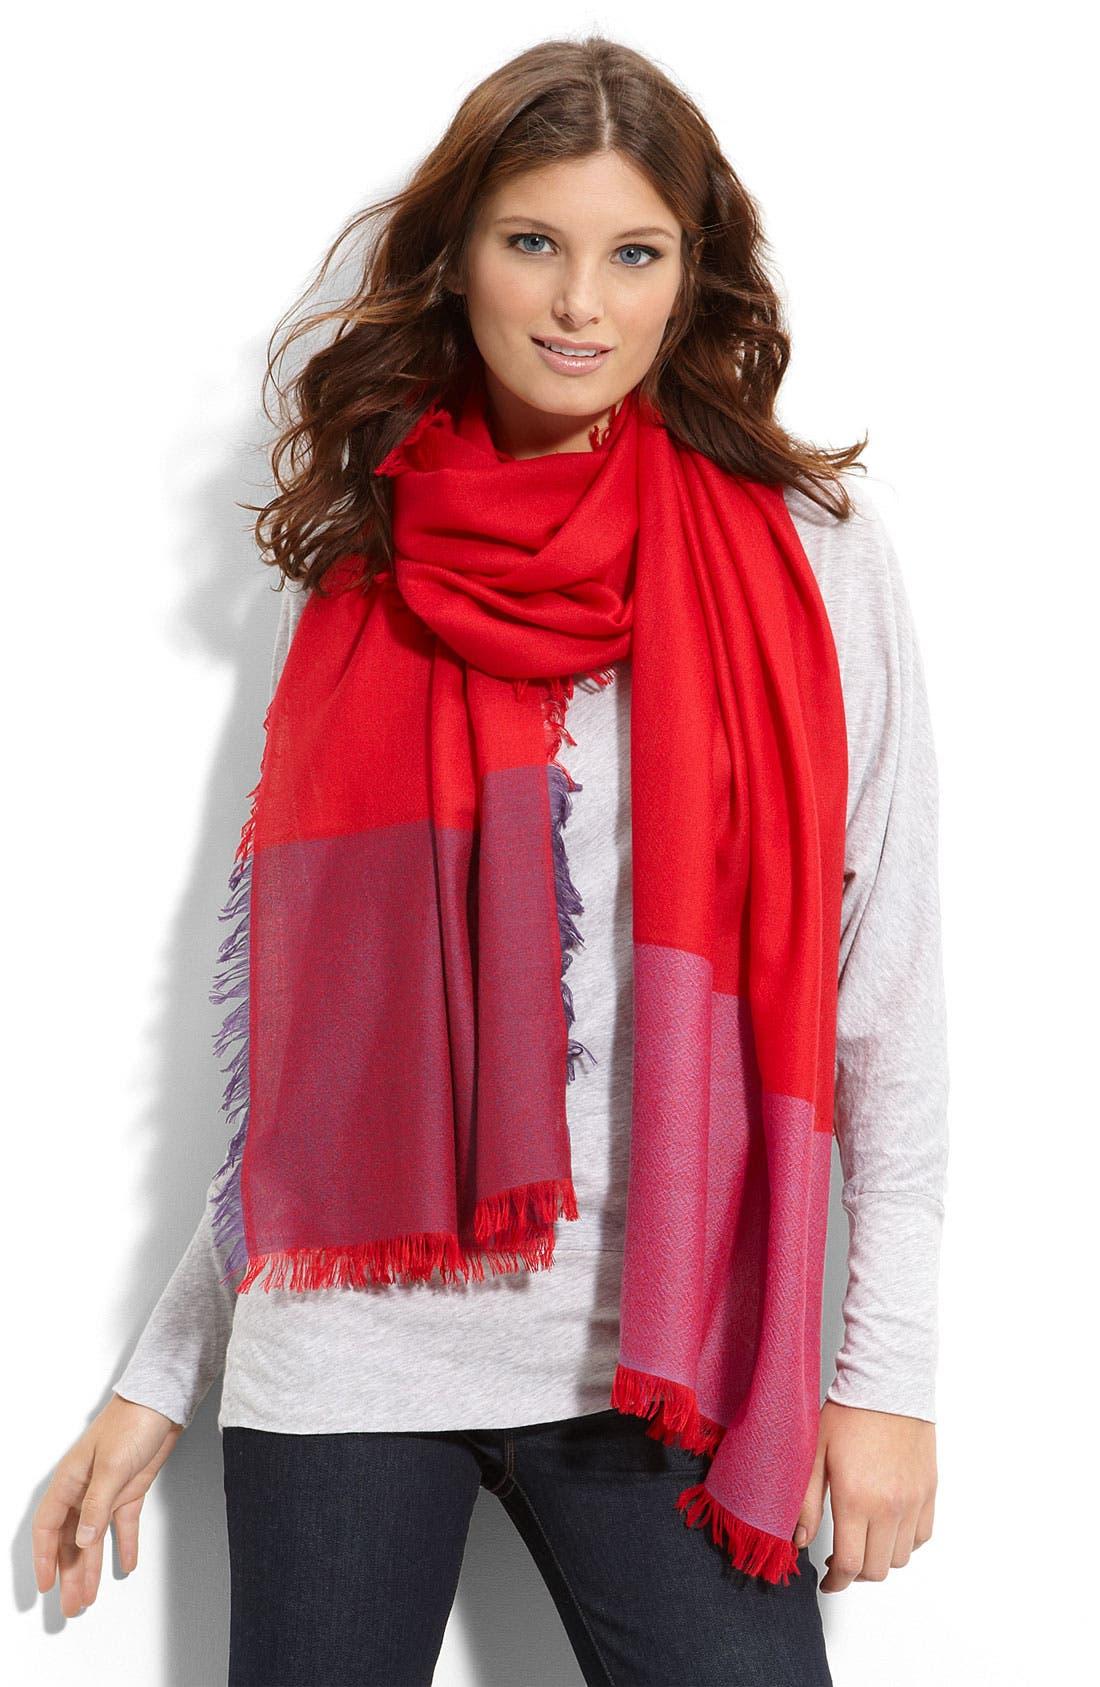 Alternate Image 1 Selected - Nordstrom 'Eyelash' Colorblock Cashmere Wrap